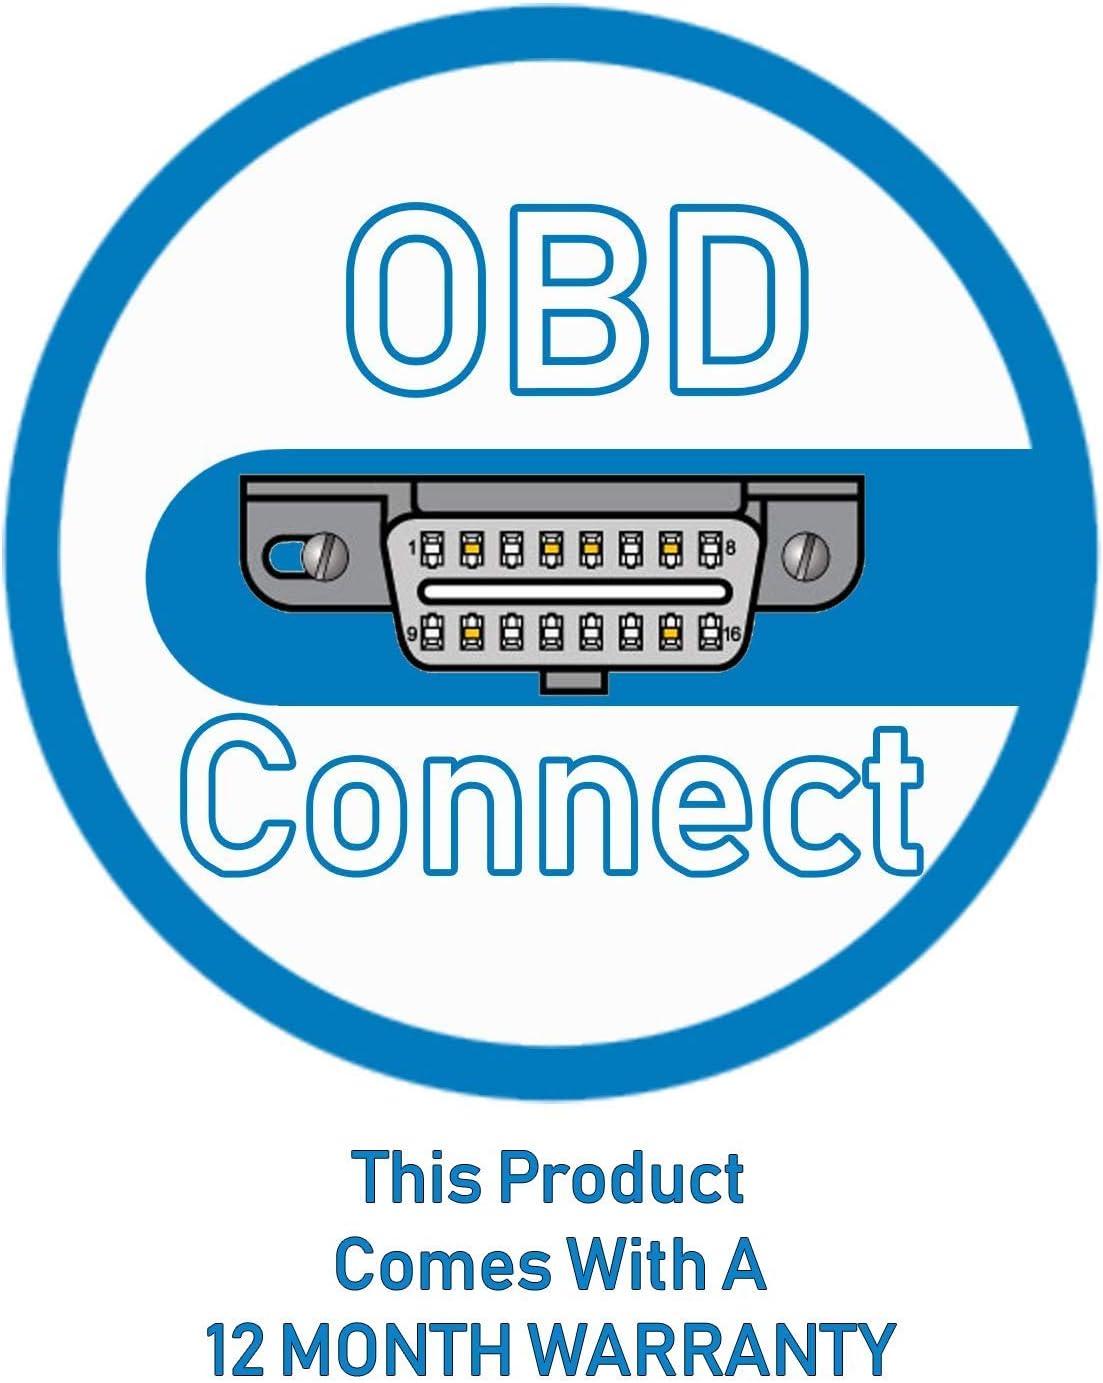 OBD Connect Advanced Bluetooth 4.0 OBD Diagnostic ECU Scanner//Fault Code Reader